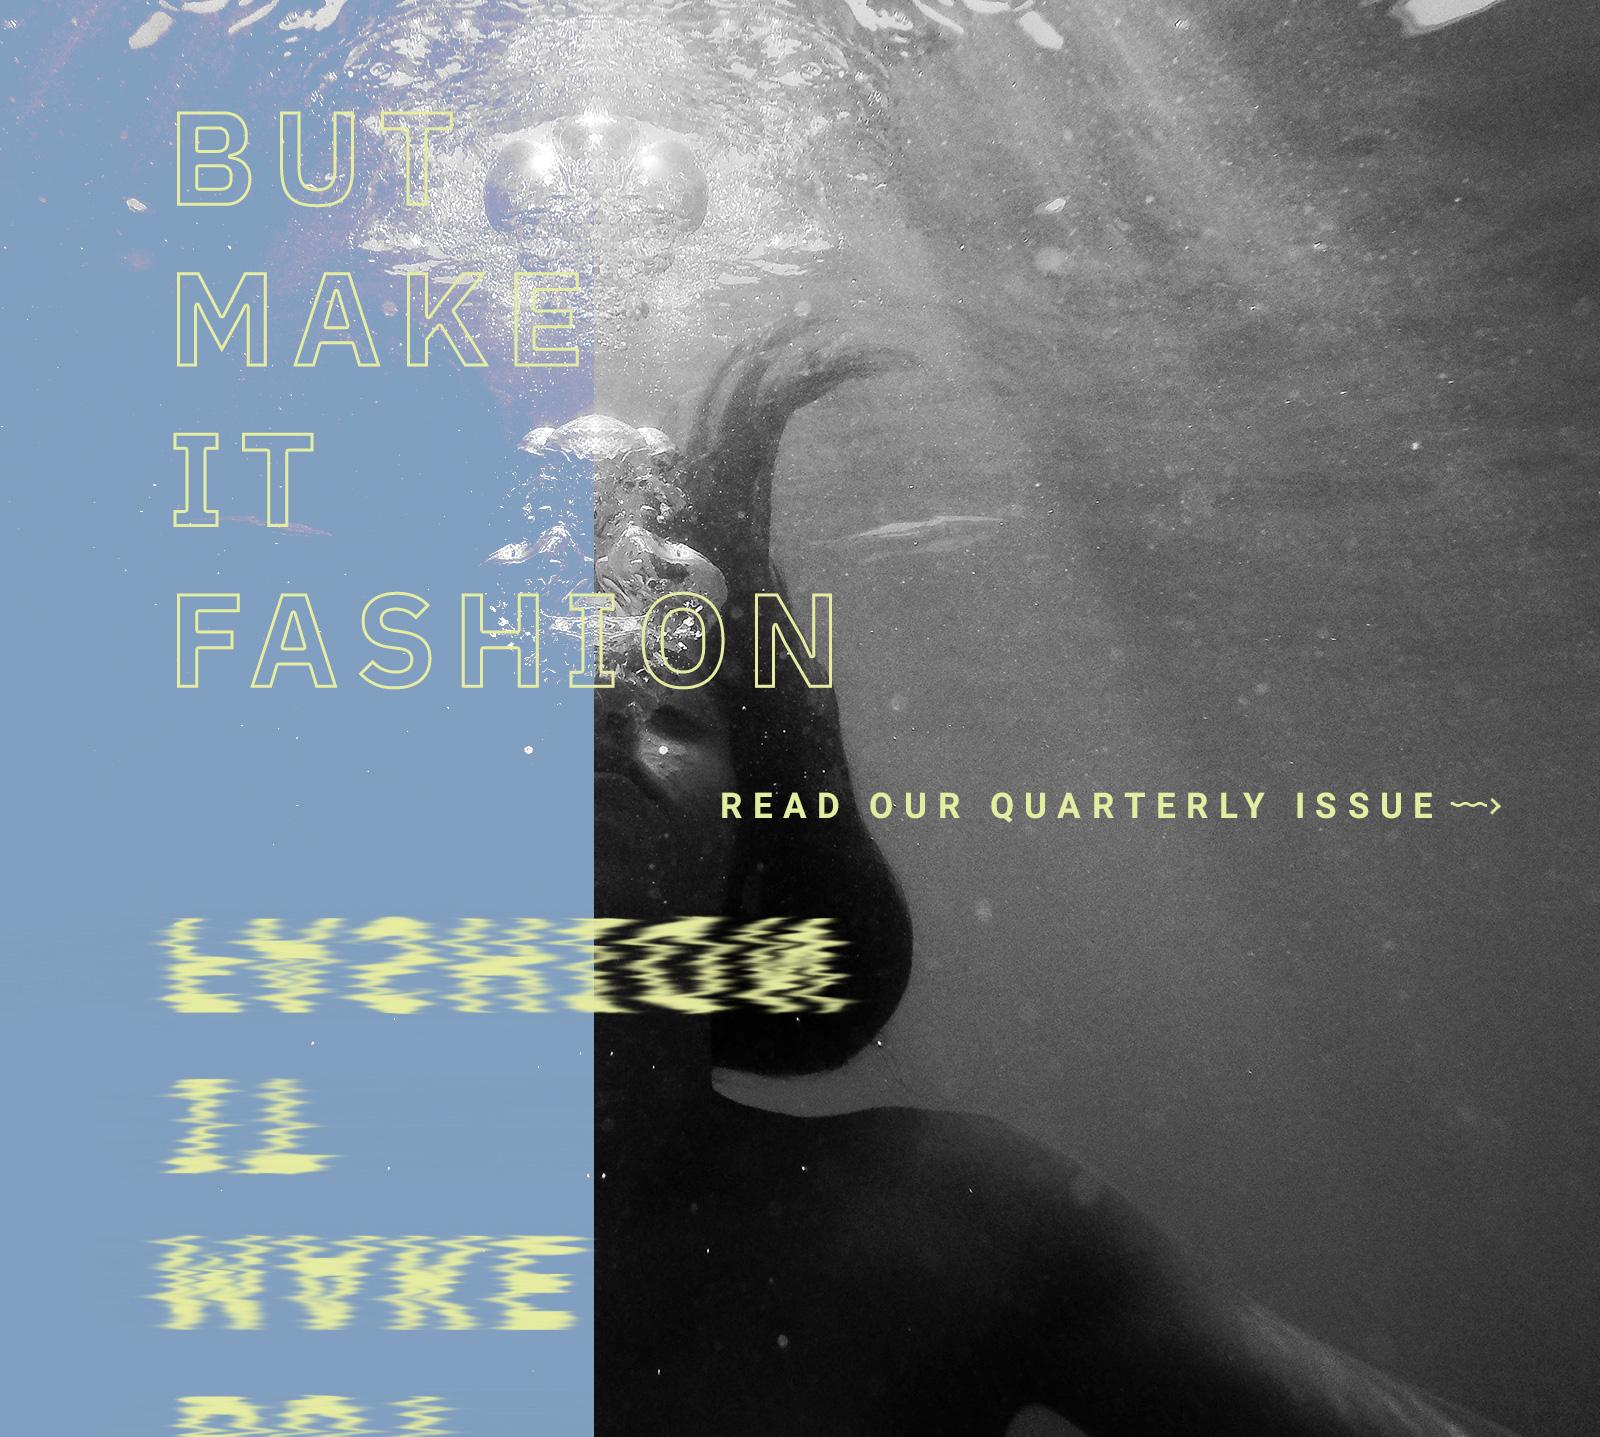 but make it fashion